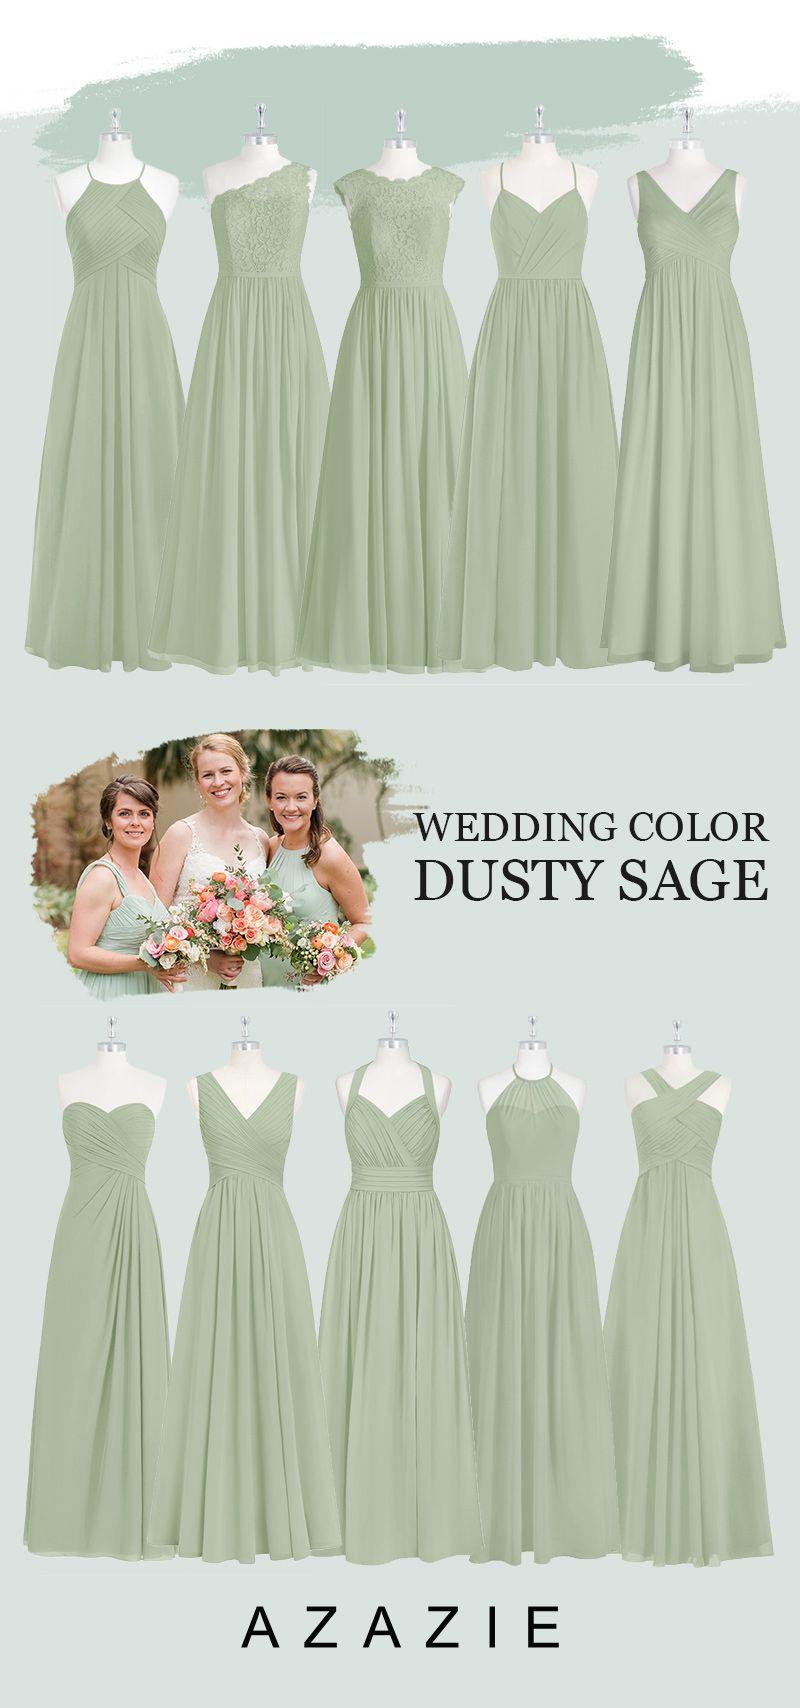 Azazie Elegant Dusty Sage Bridesmaid Dresses In 2020 Bridesmaid Dresses Dusty Sage Sage Bridesmaid Dresses Azazie Bridesmaid Dresses